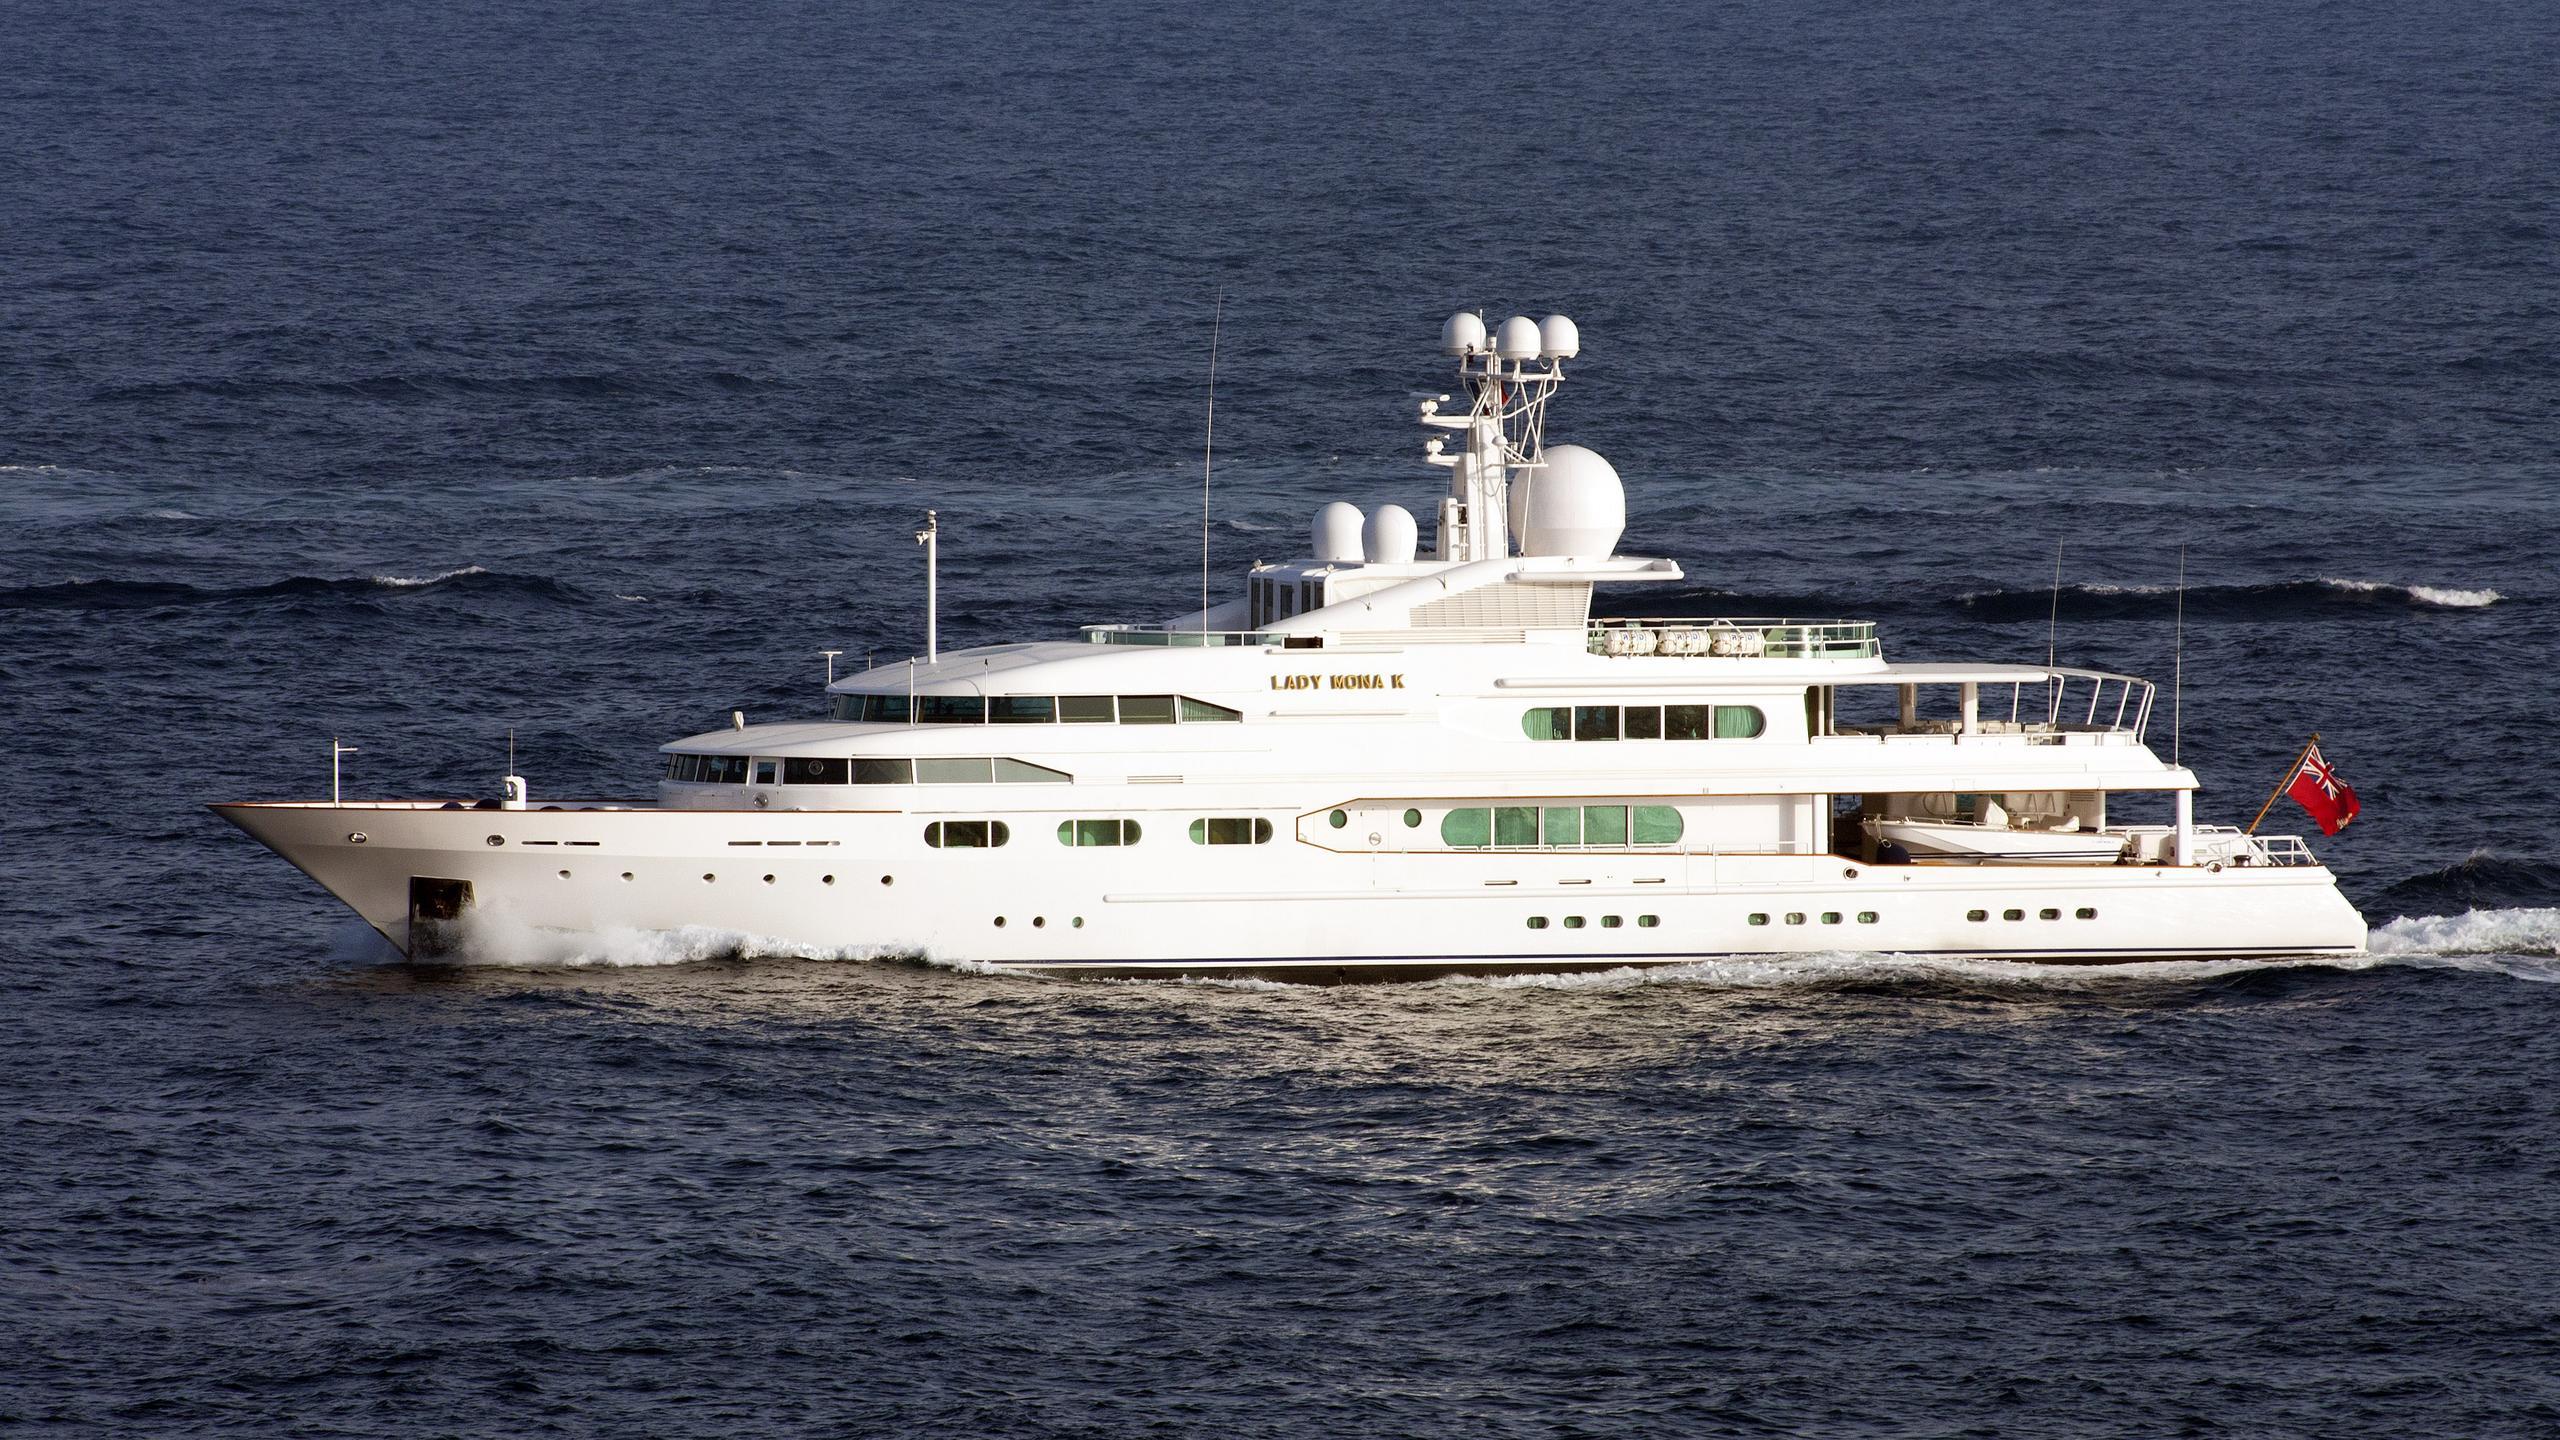 dancing hare lady mona k motor yacht amels 1986 58m cruising half profile